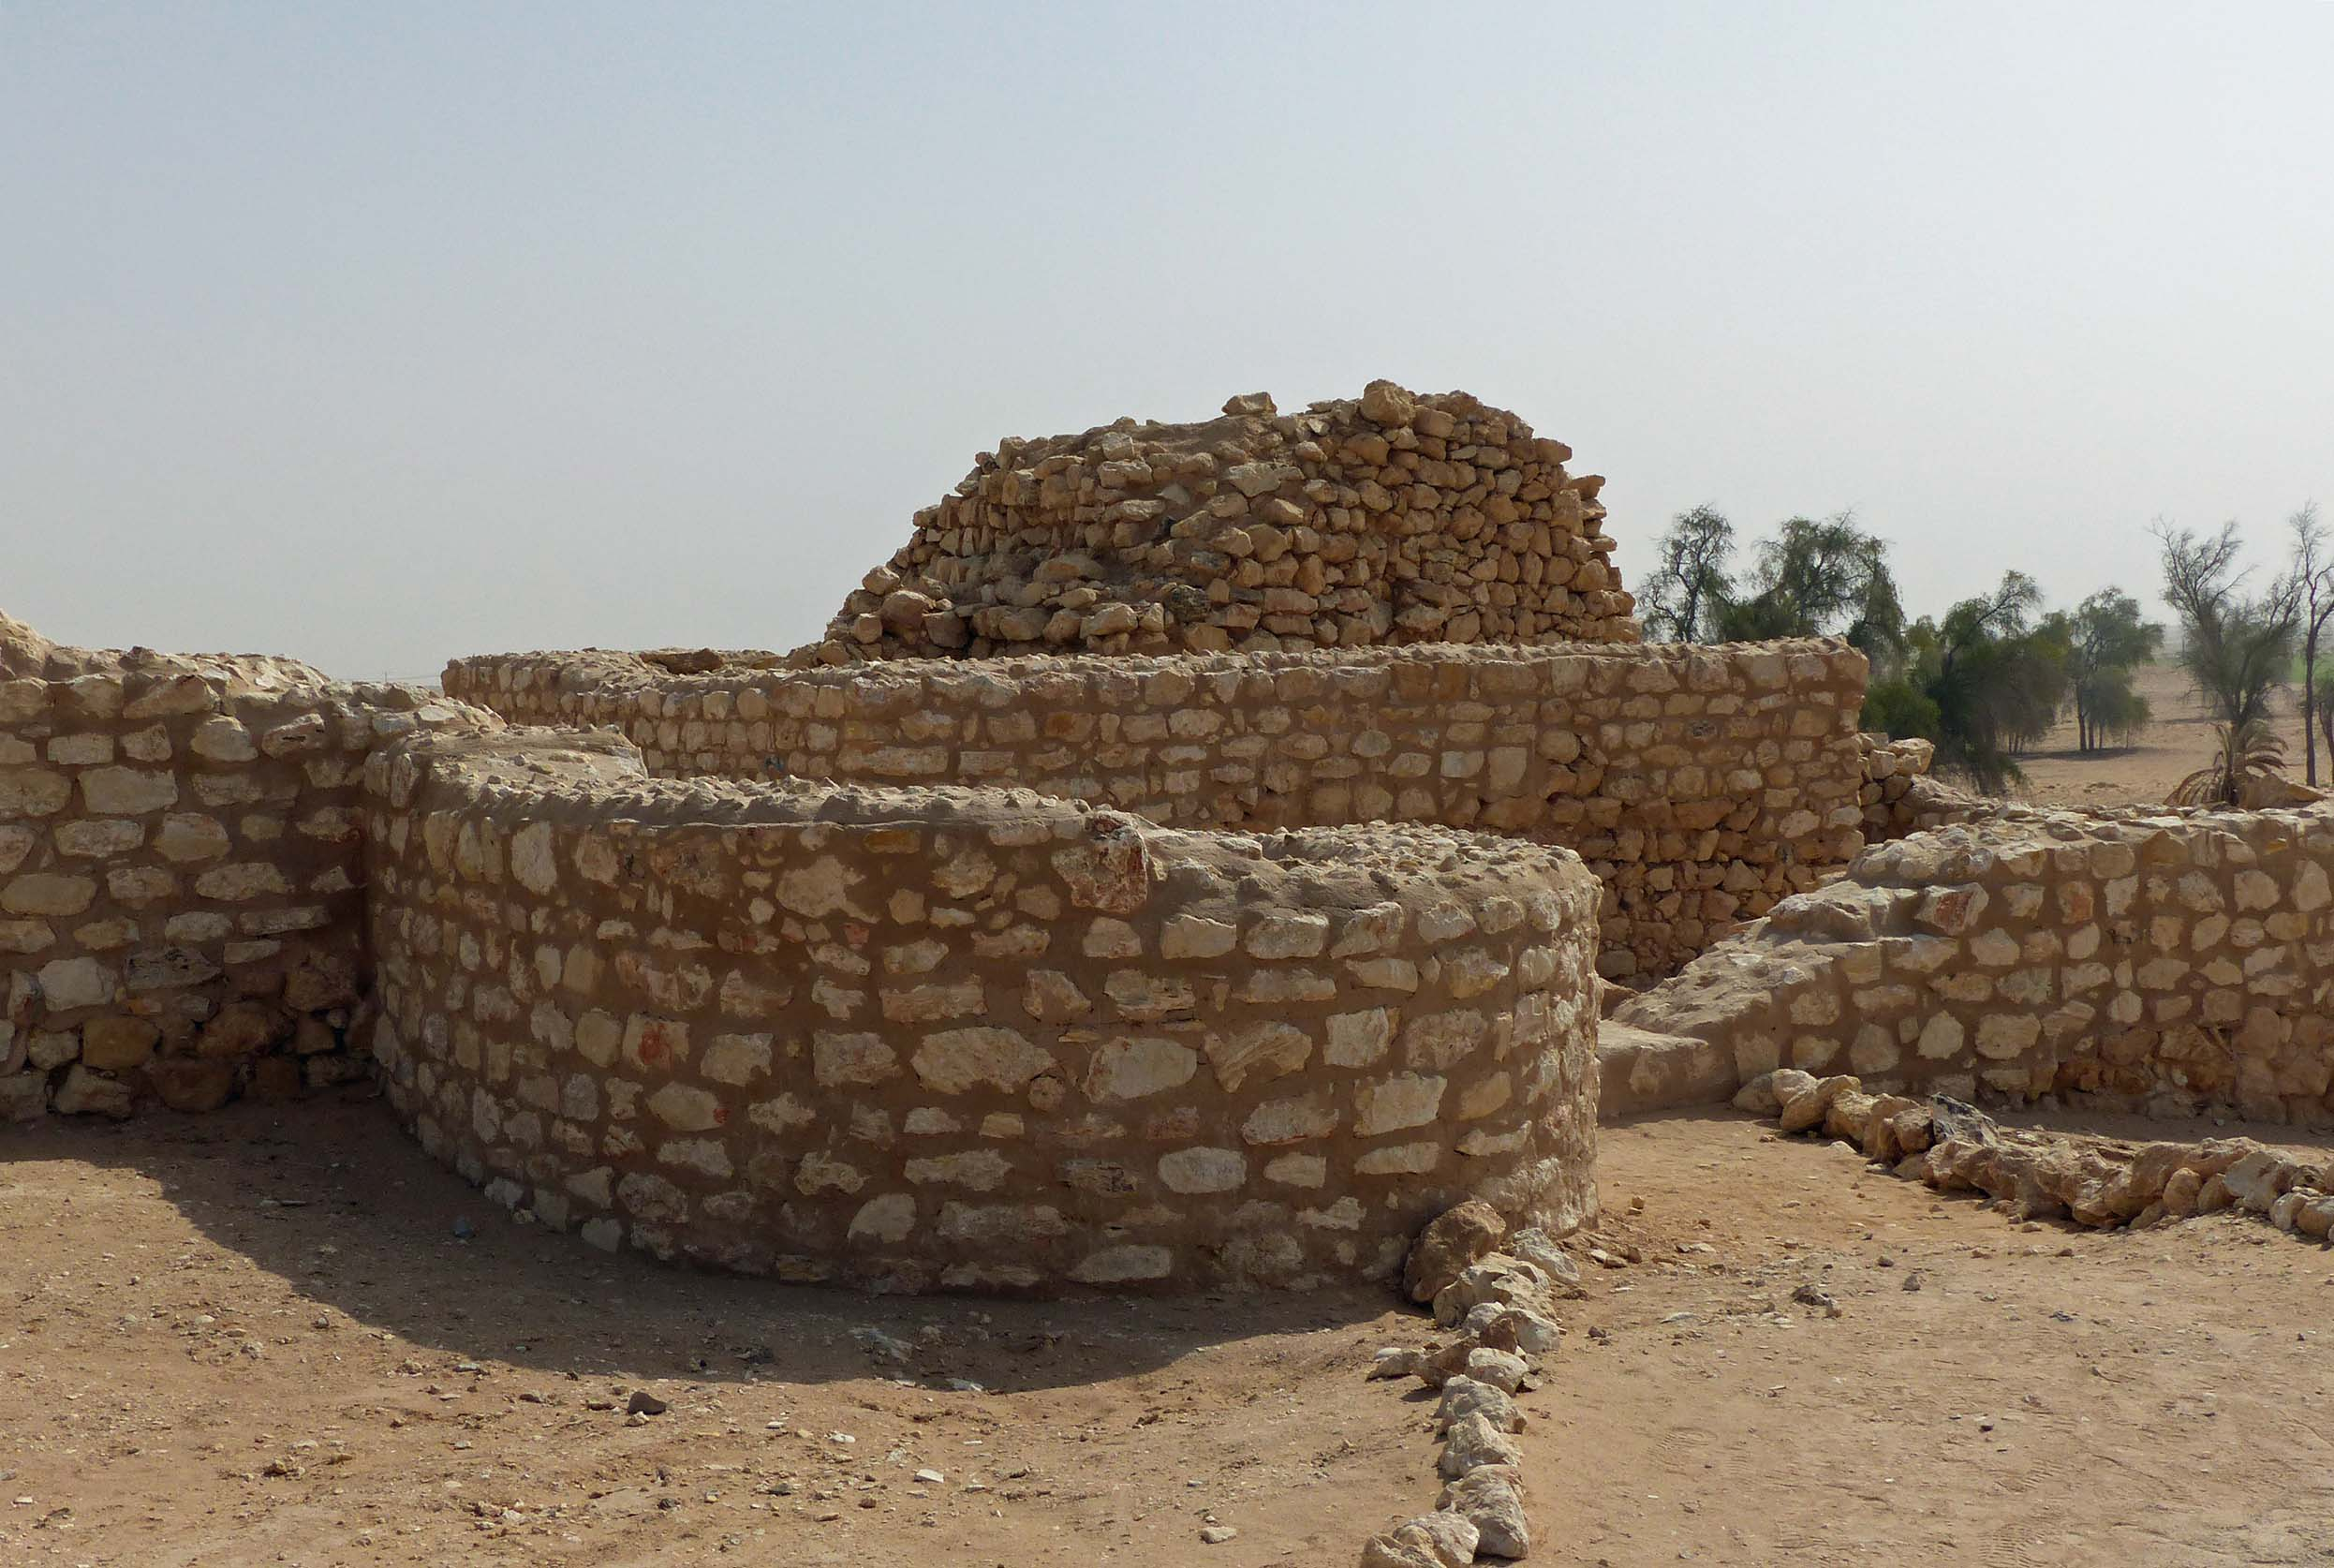 Low stone walls